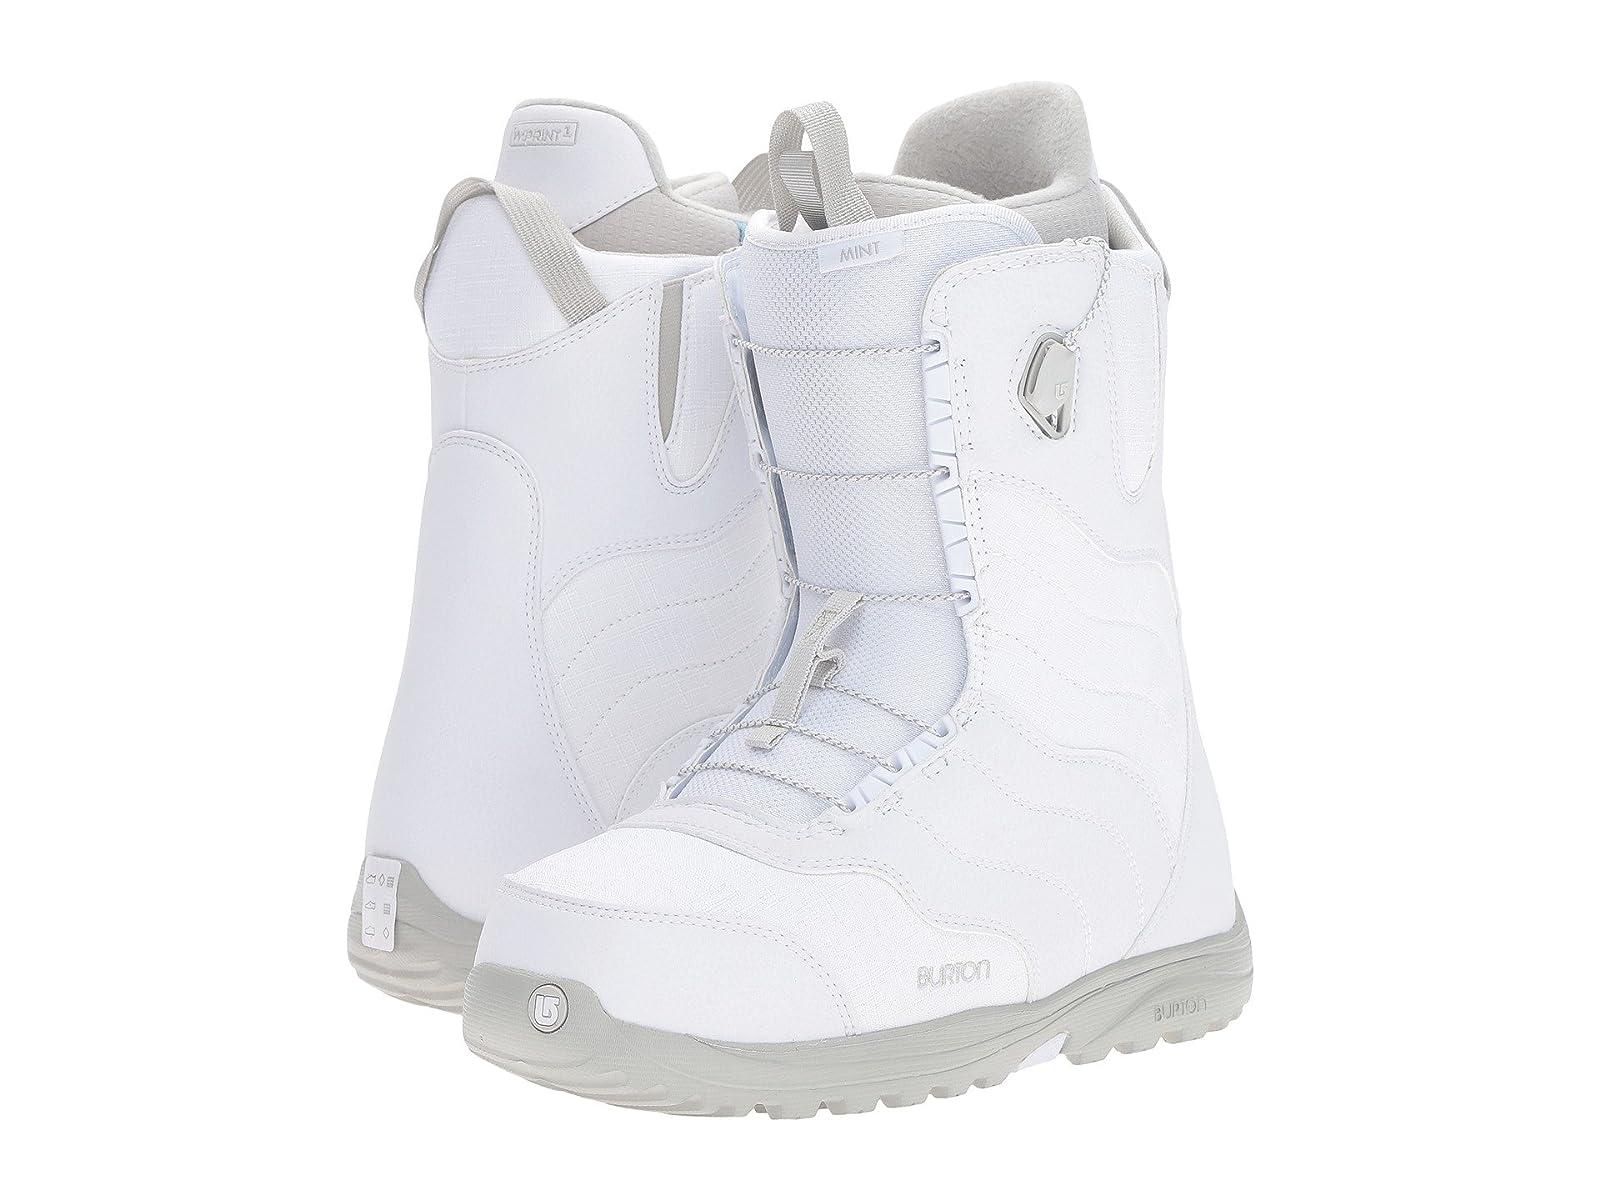 Burton Mint '17Cheap and distinctive eye-catching shoes